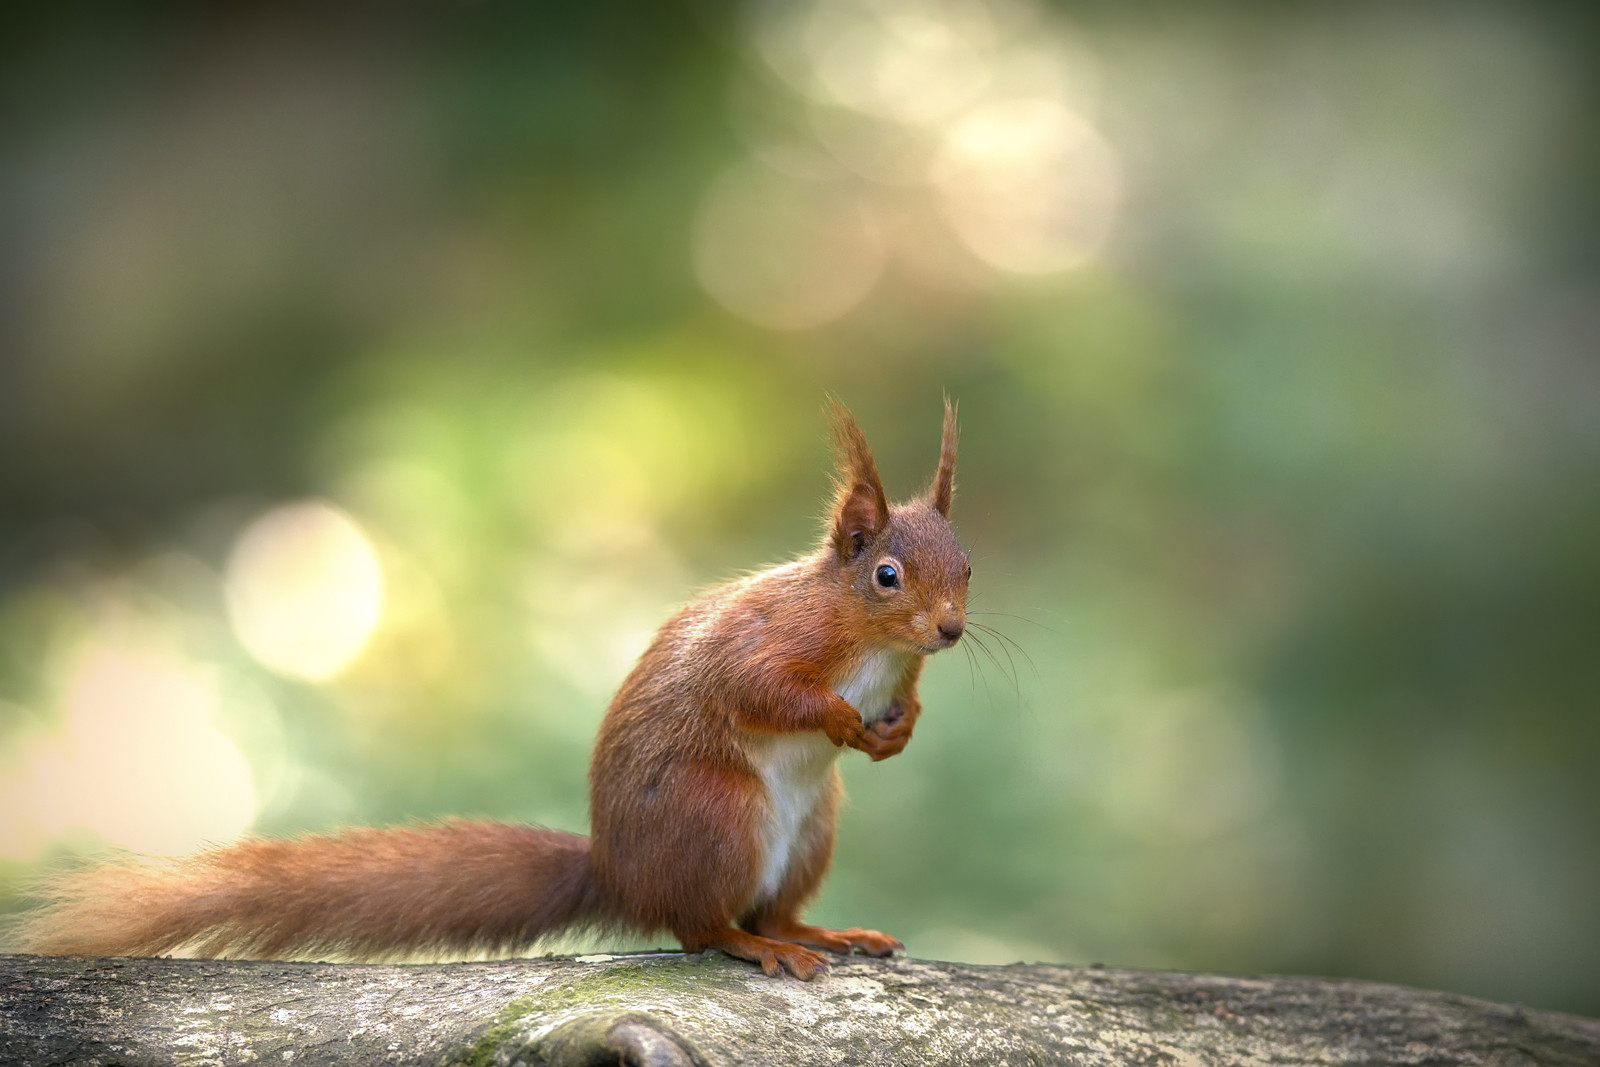 PDI - Squirrel on a log by Alan Hillen (12 marks)